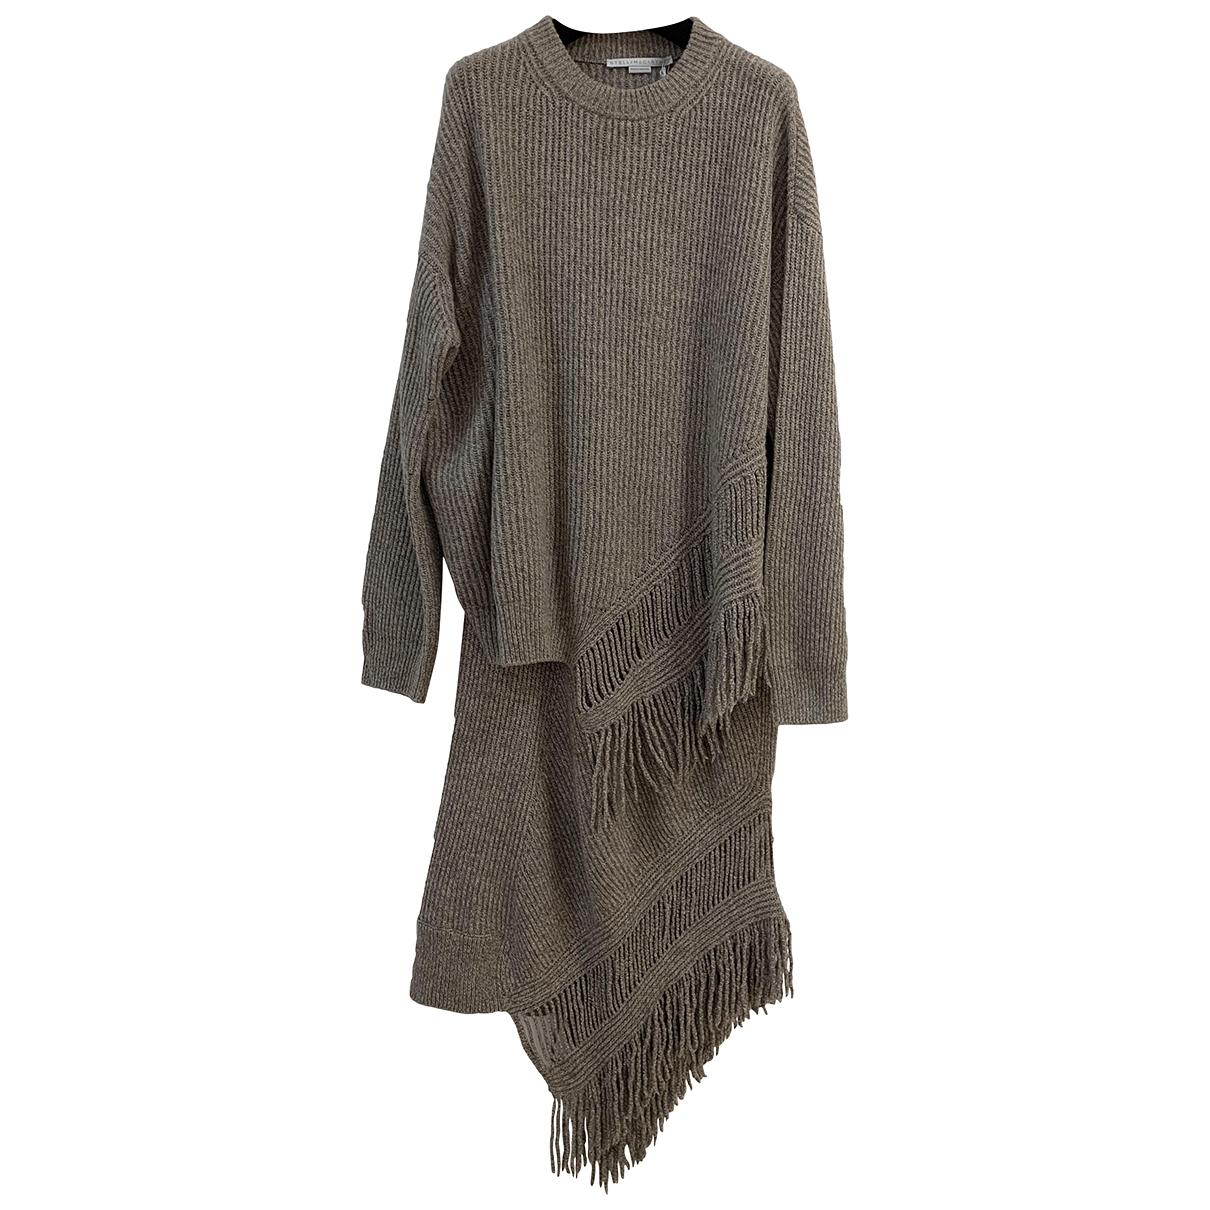 Stella Mccartney \N Kleid in  Braun Wolle